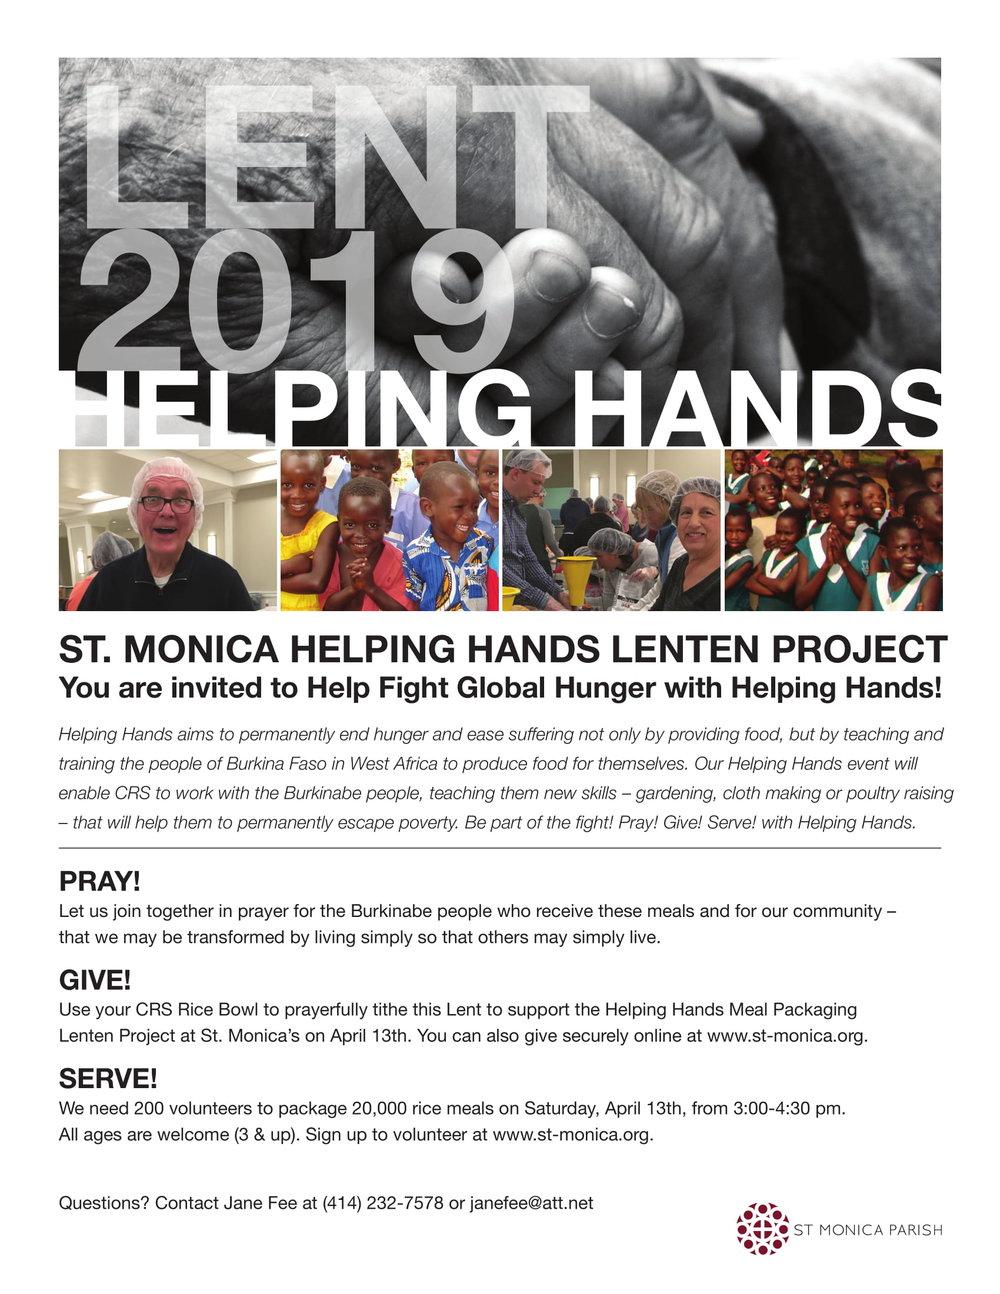 www.st-monica.org    janefee@att.net